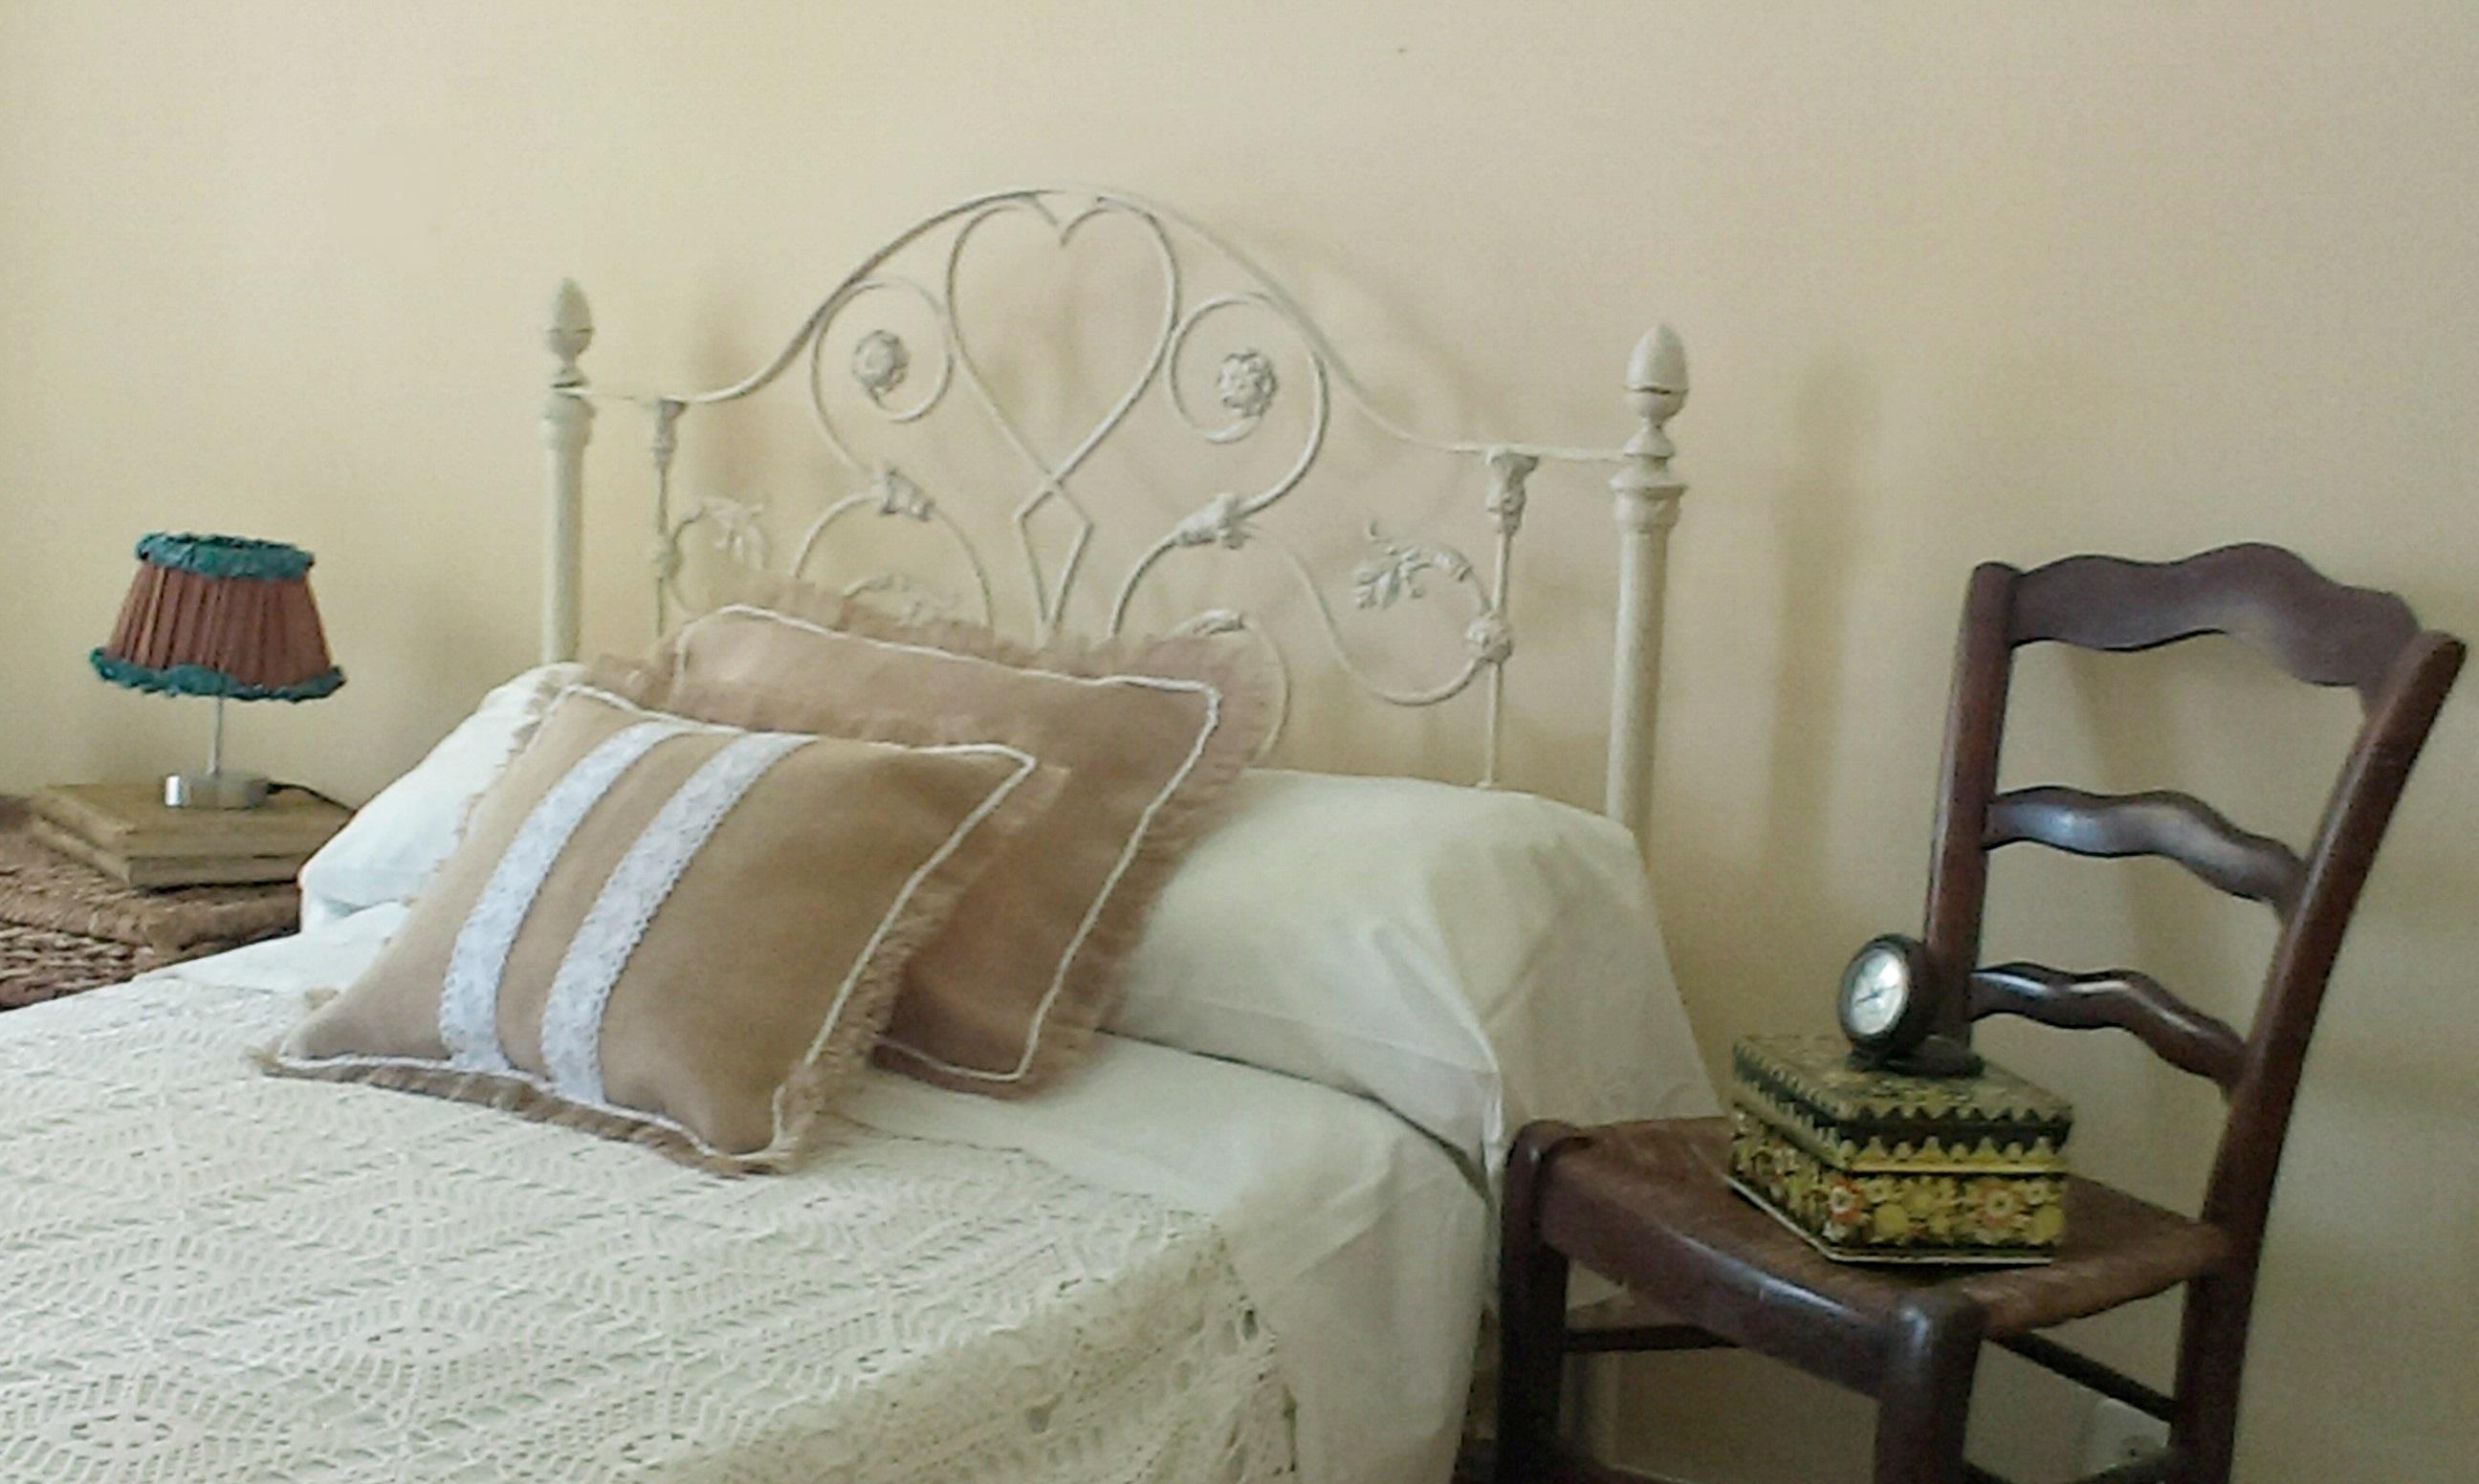 Antigua cama de forja estilo shabby shabby old iron bed - Habitaciones de forja ...